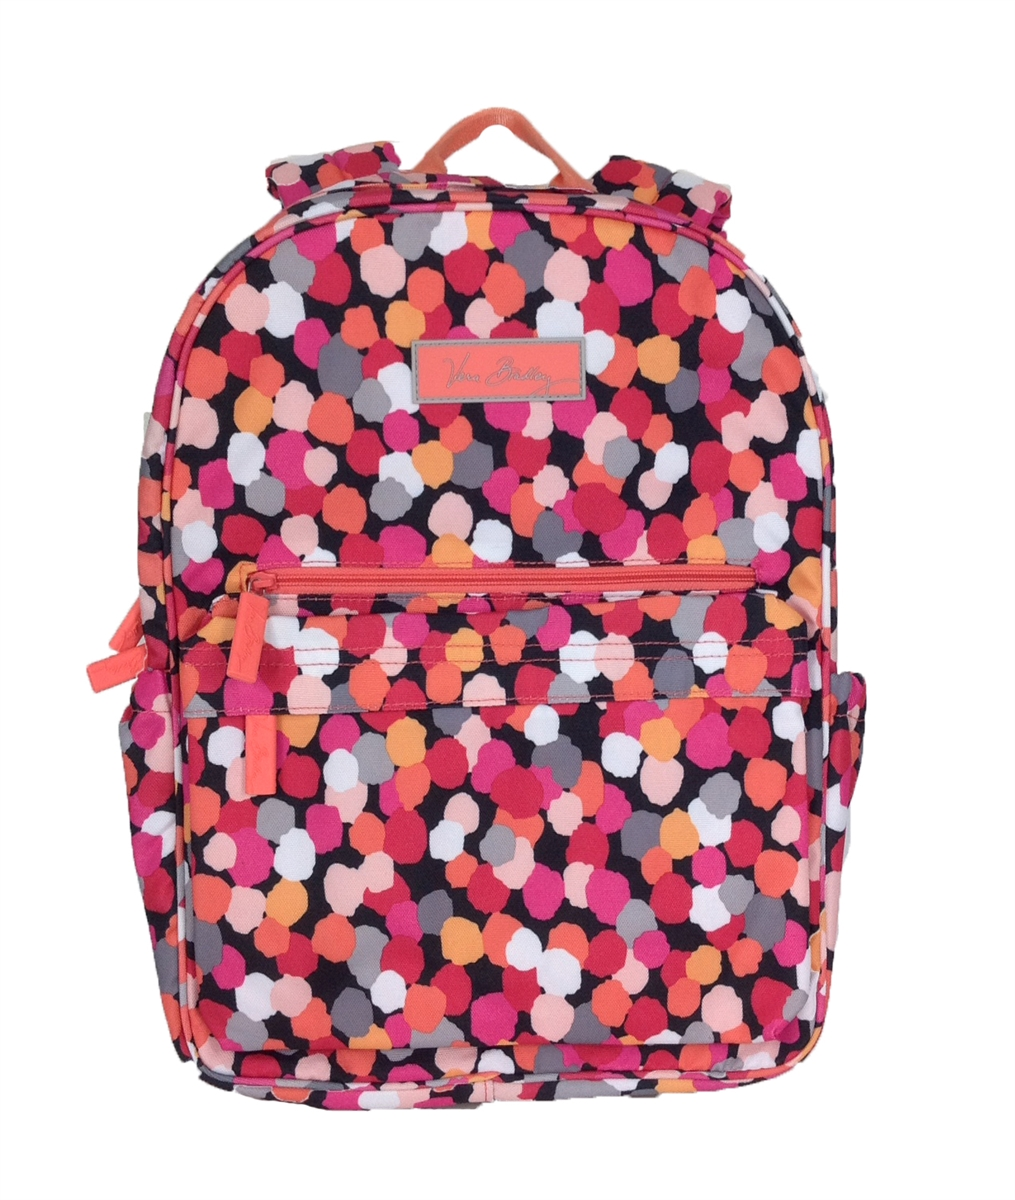 1ea820947d Vera Bradley Lighten Up Just Right Backpack